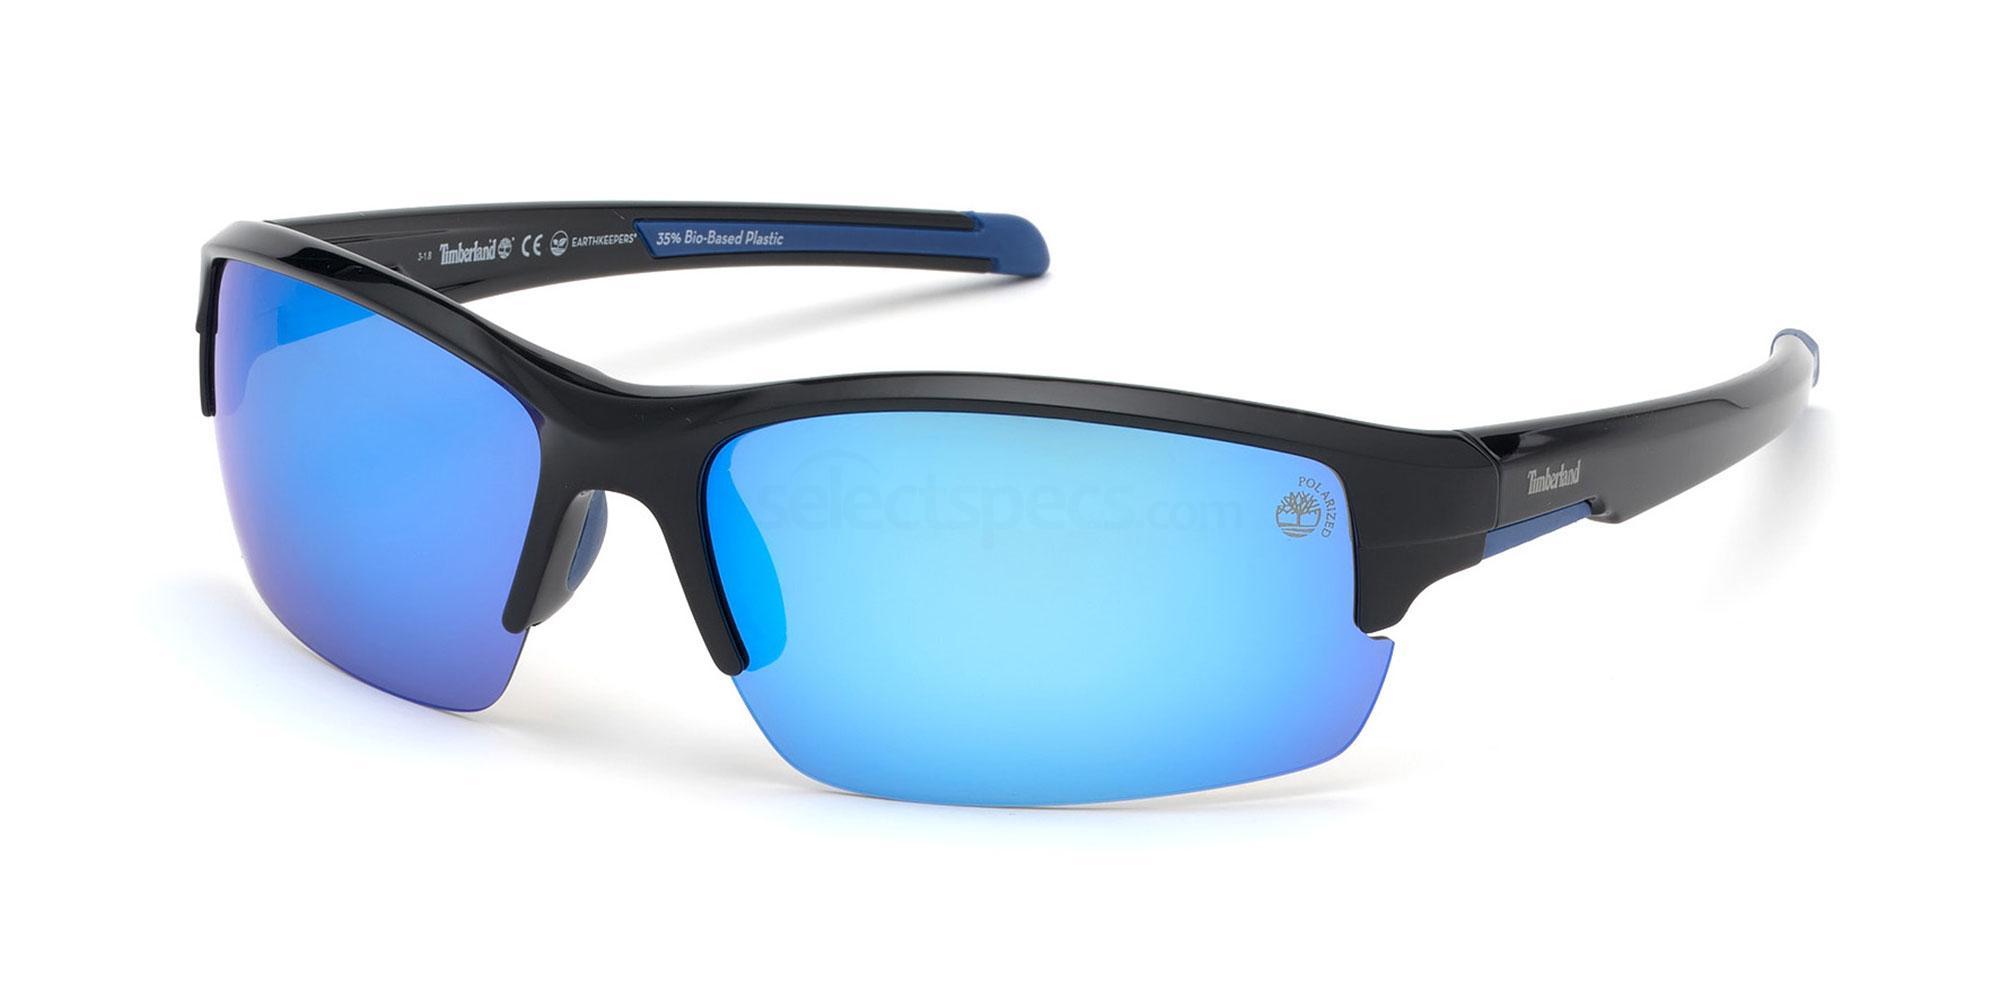 01D TB9173 Sunglasses, Timberland